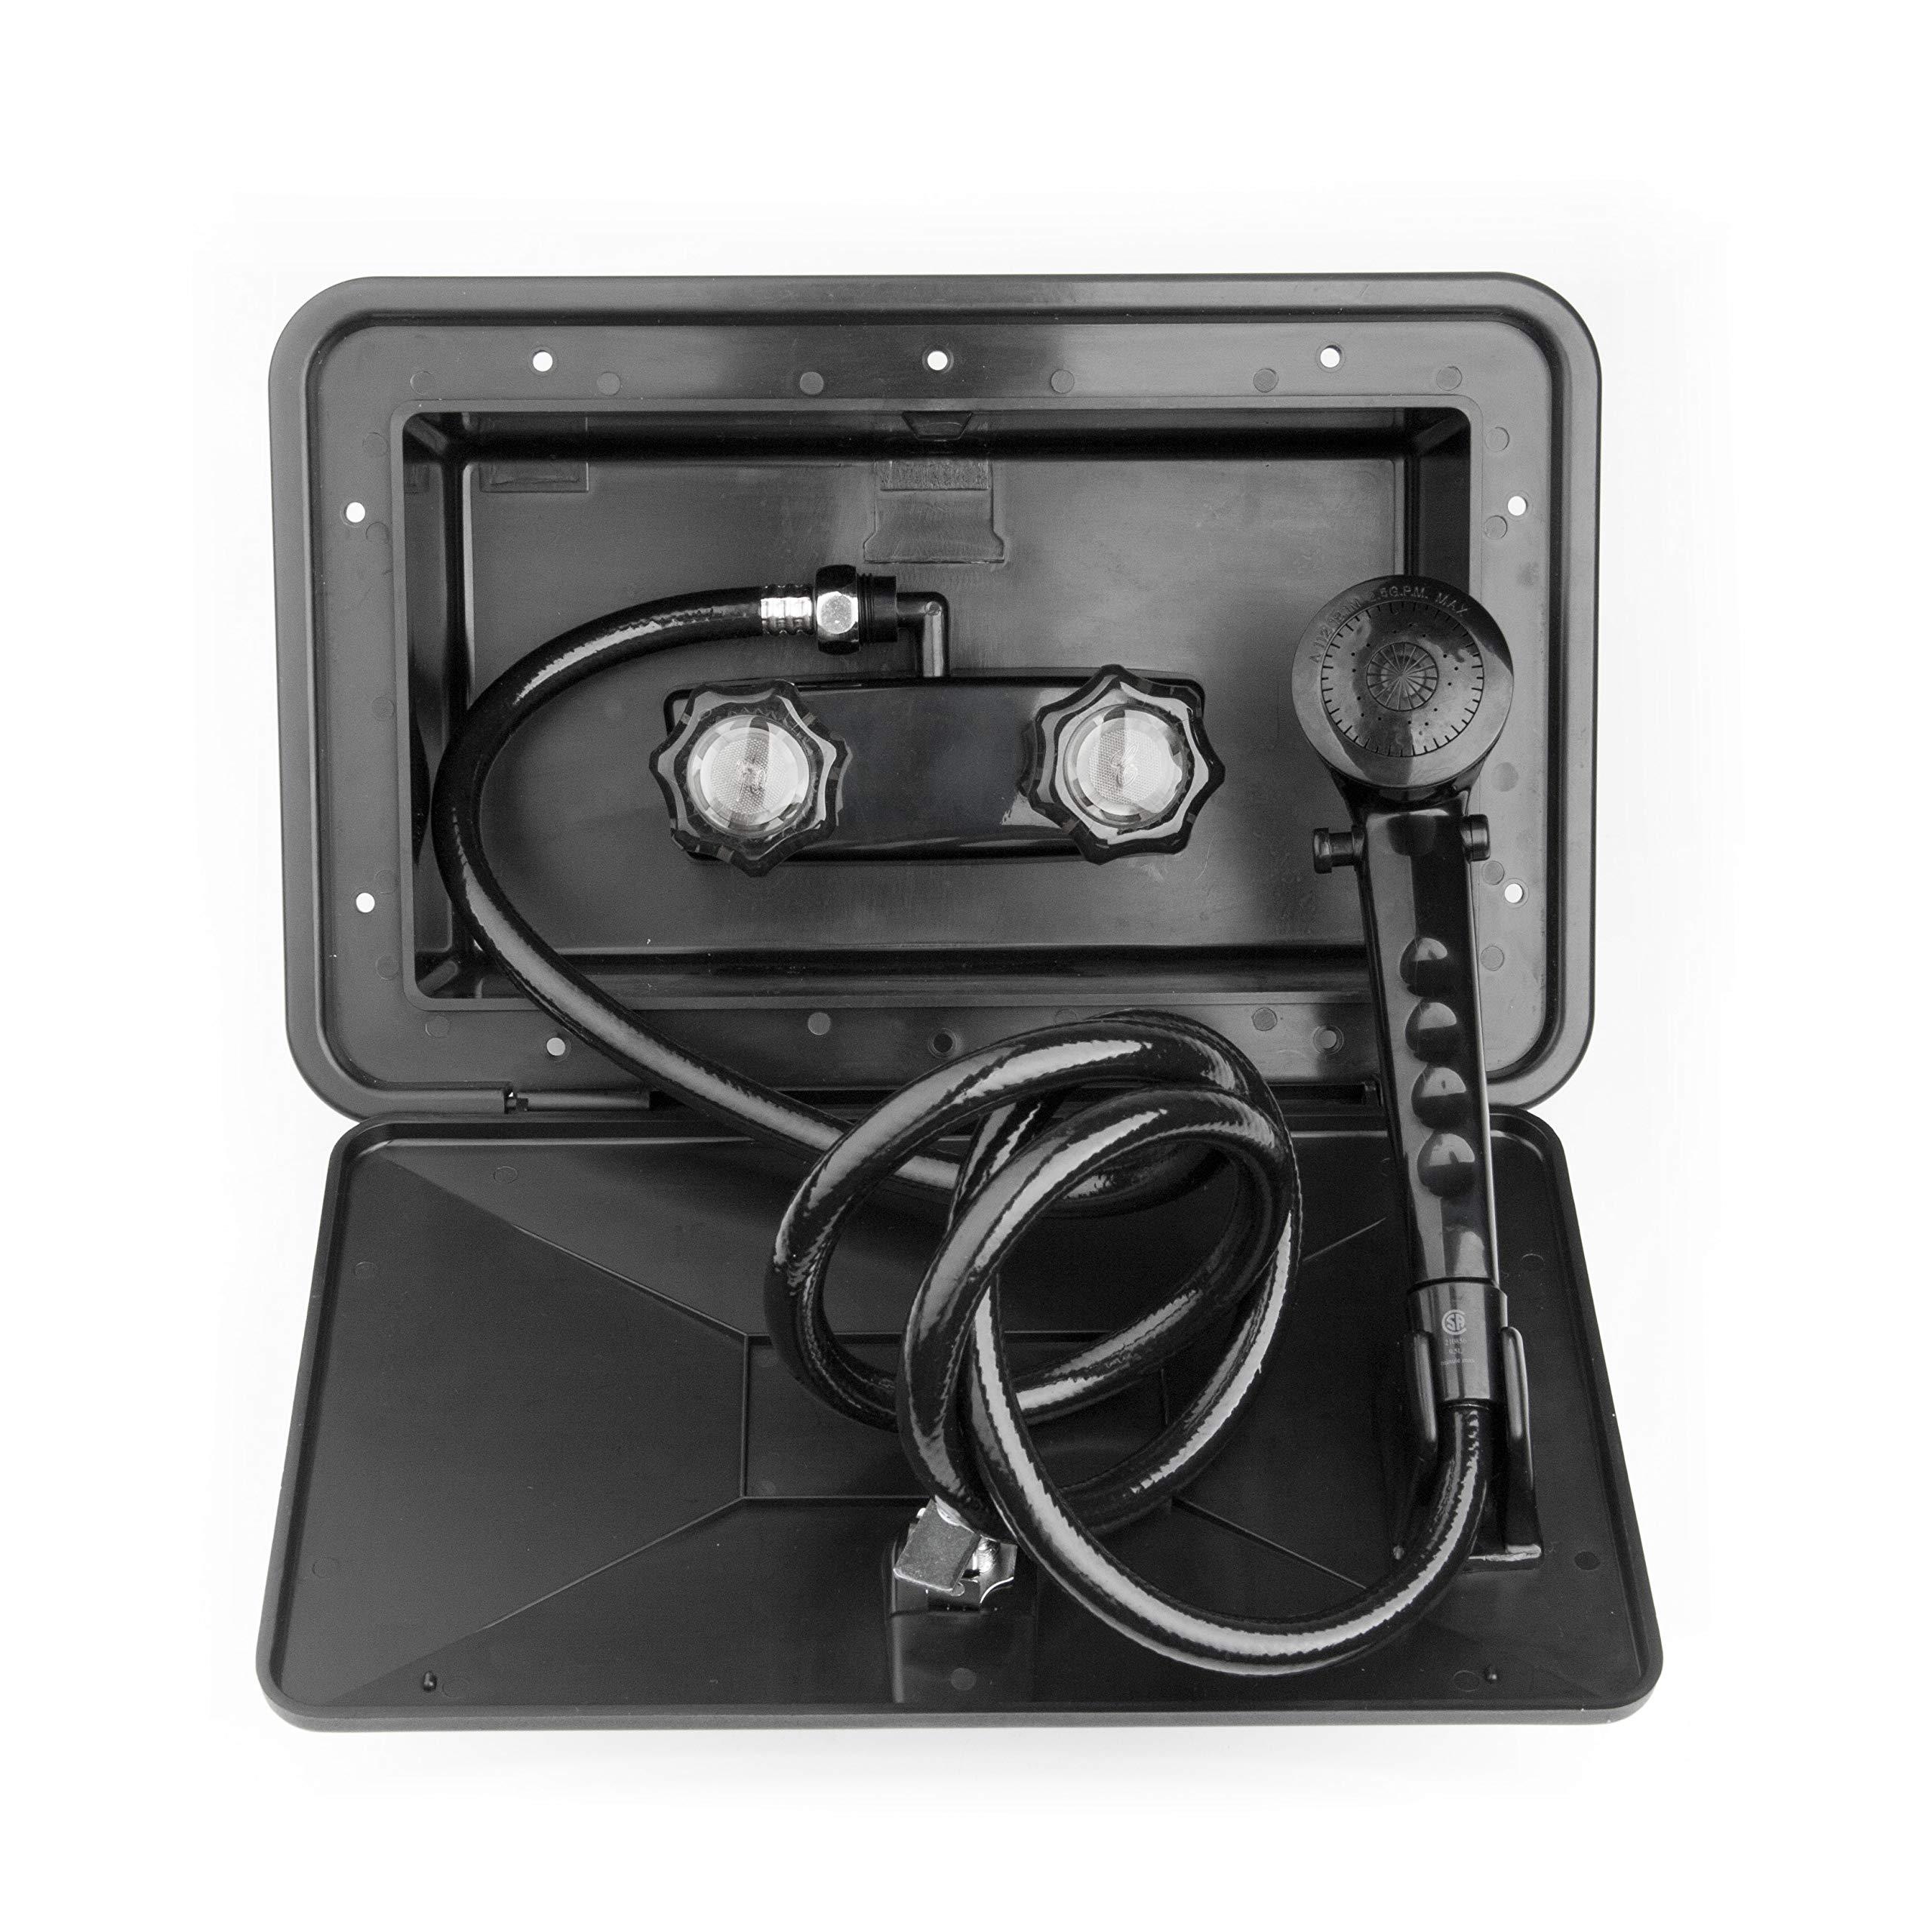 Dura Faucet DF-SA170-BK RV Exterior Shower Box Kit with Lock (Black) by Dura Faucet